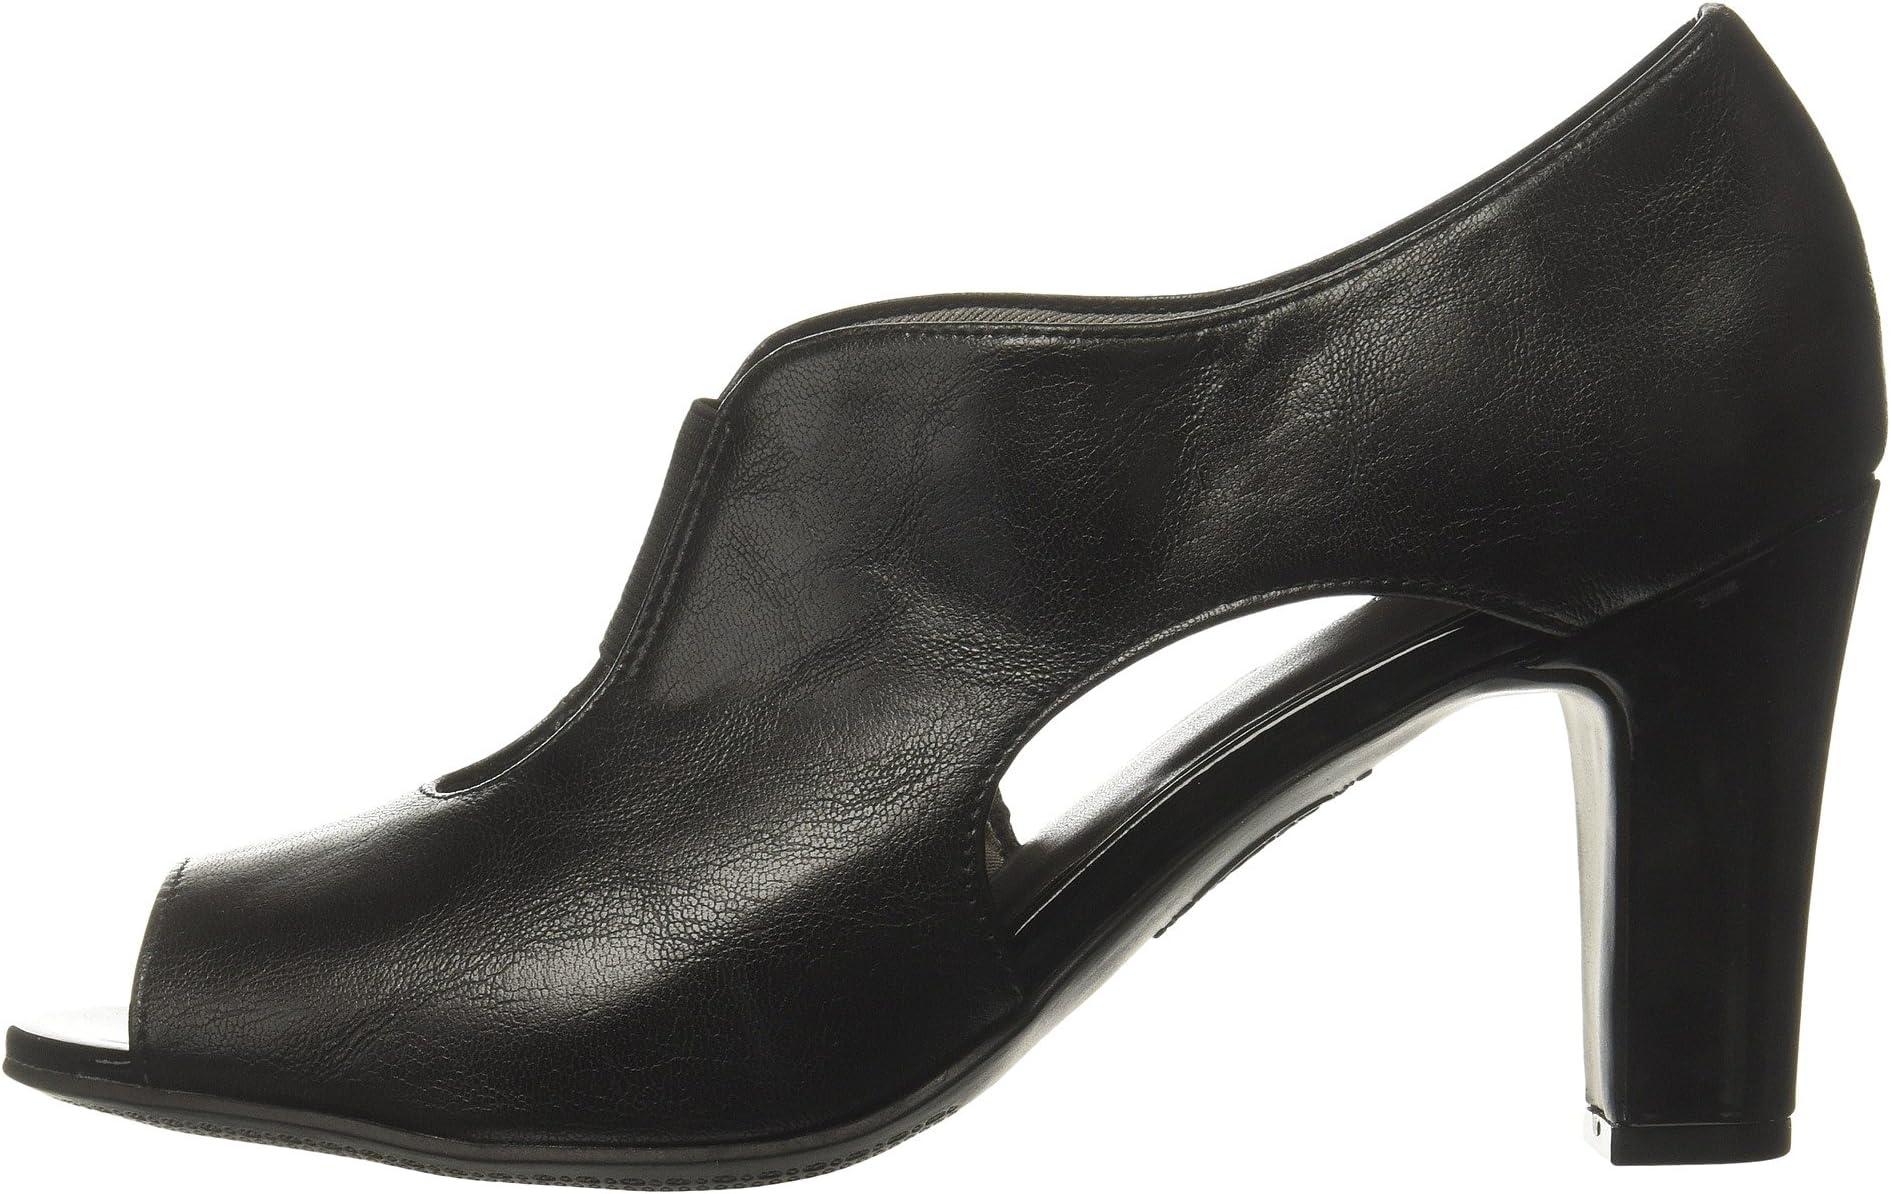 LifeStride Carla | Women's shoes | 2020 Newest